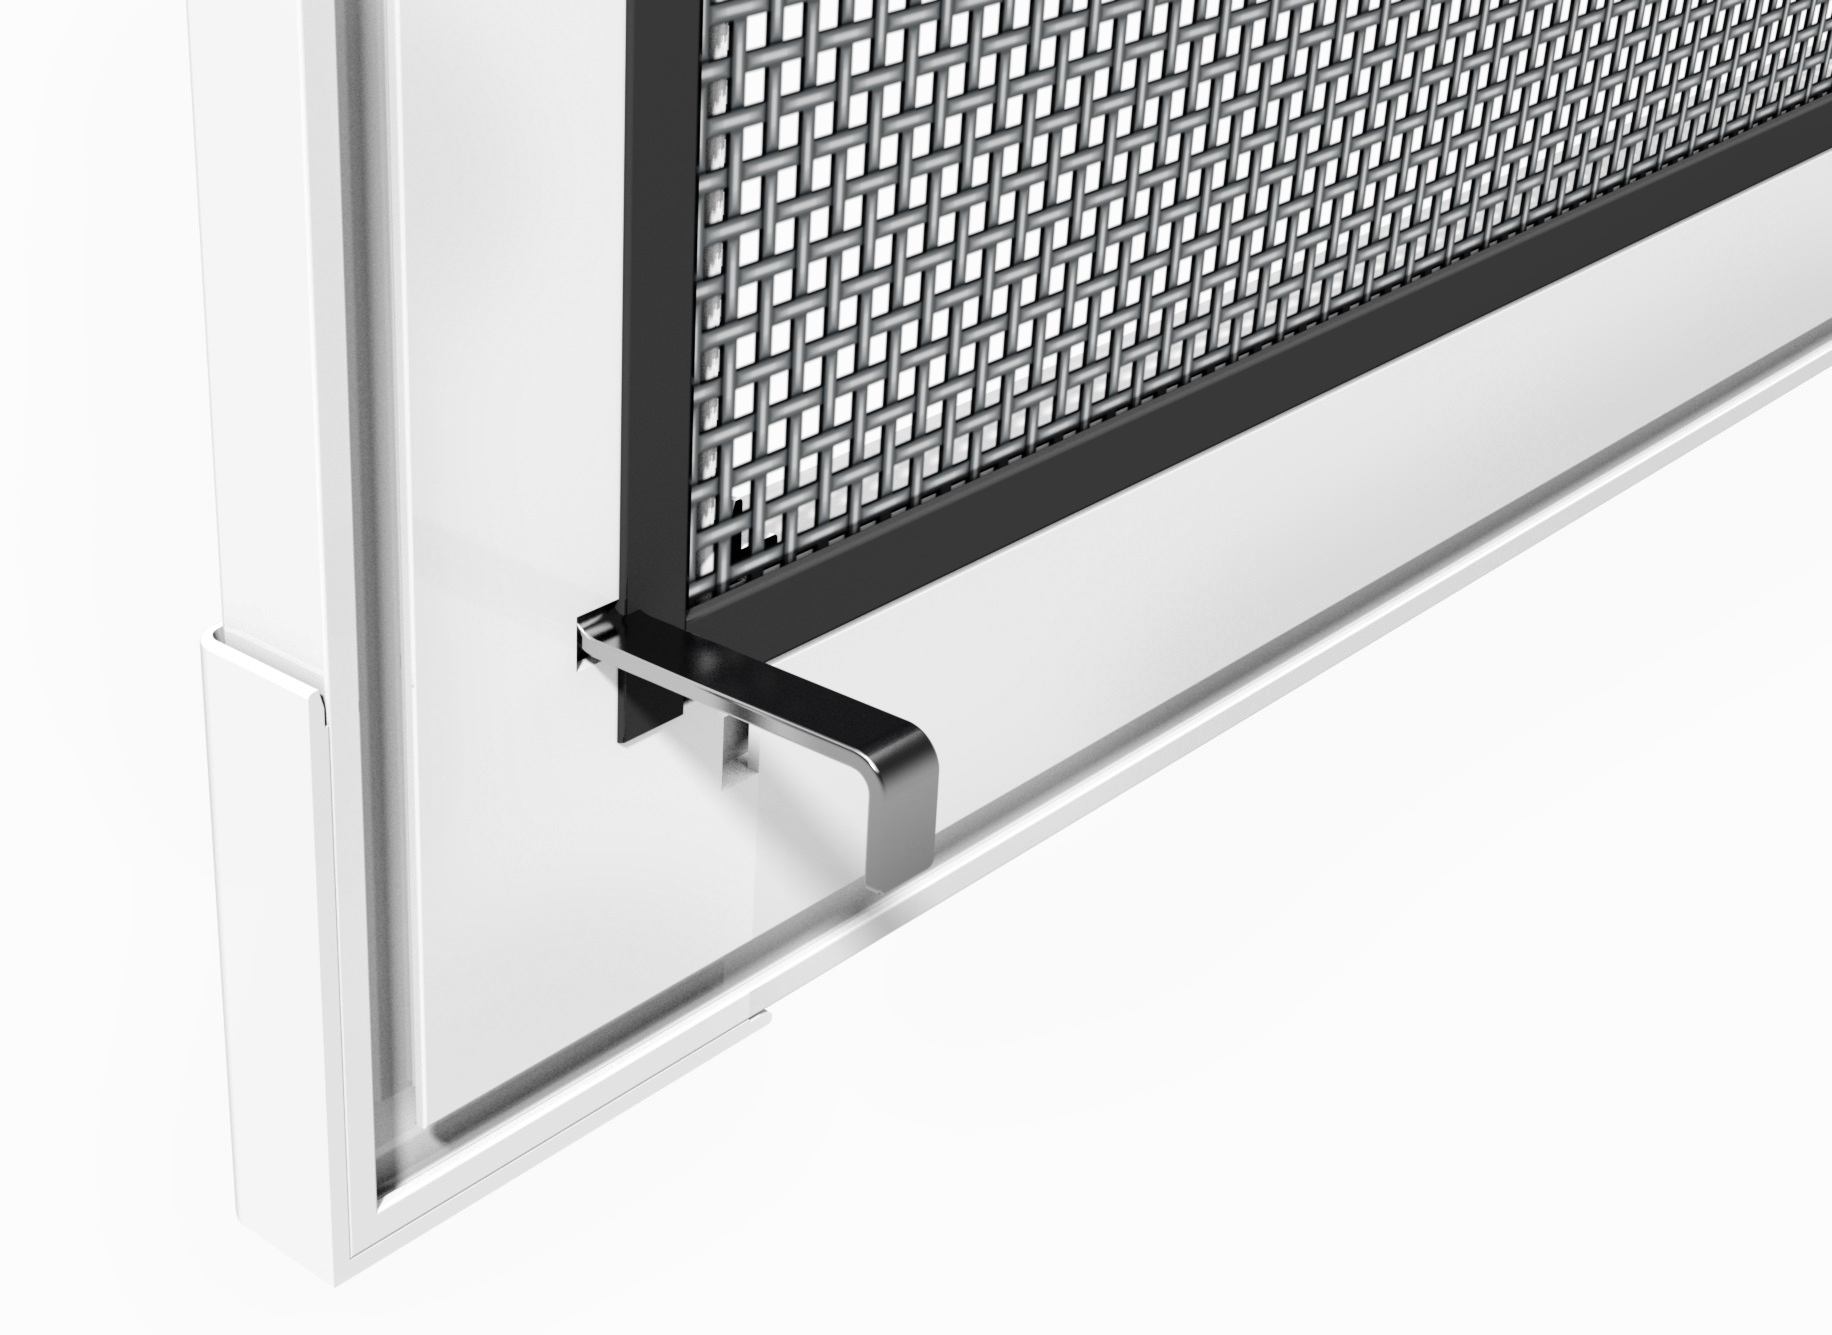 aluminium insektenschutzspannrahmen f r fenster teso insektenschutzsysteme. Black Bedroom Furniture Sets. Home Design Ideas